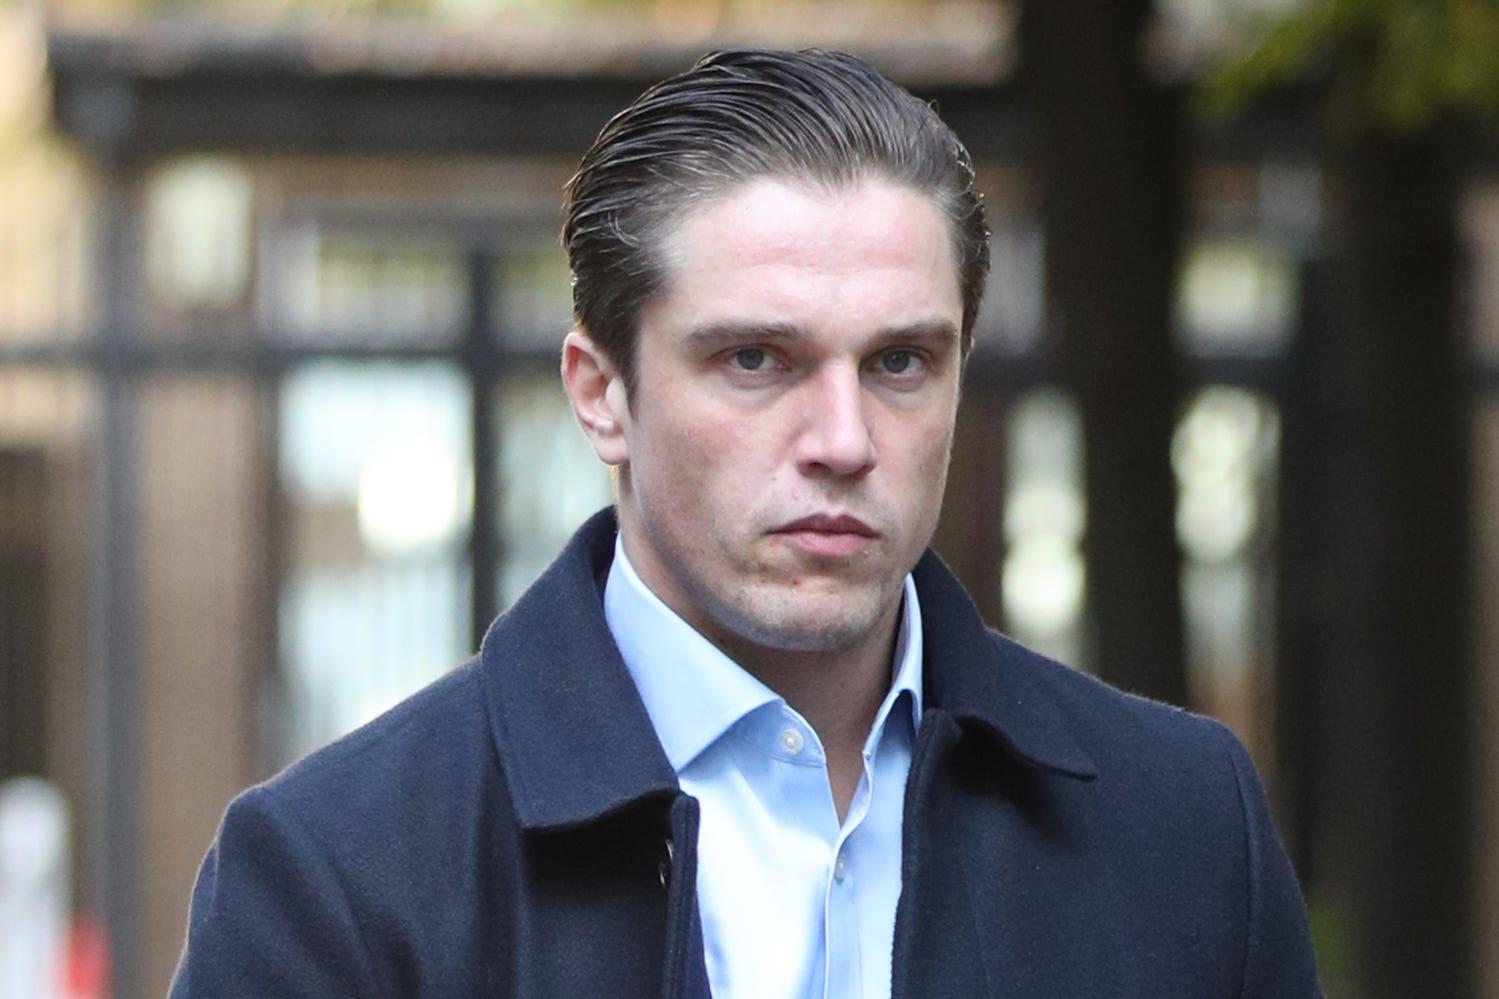 Towie star Lewis Bloor in court over alleged diamond scam plot